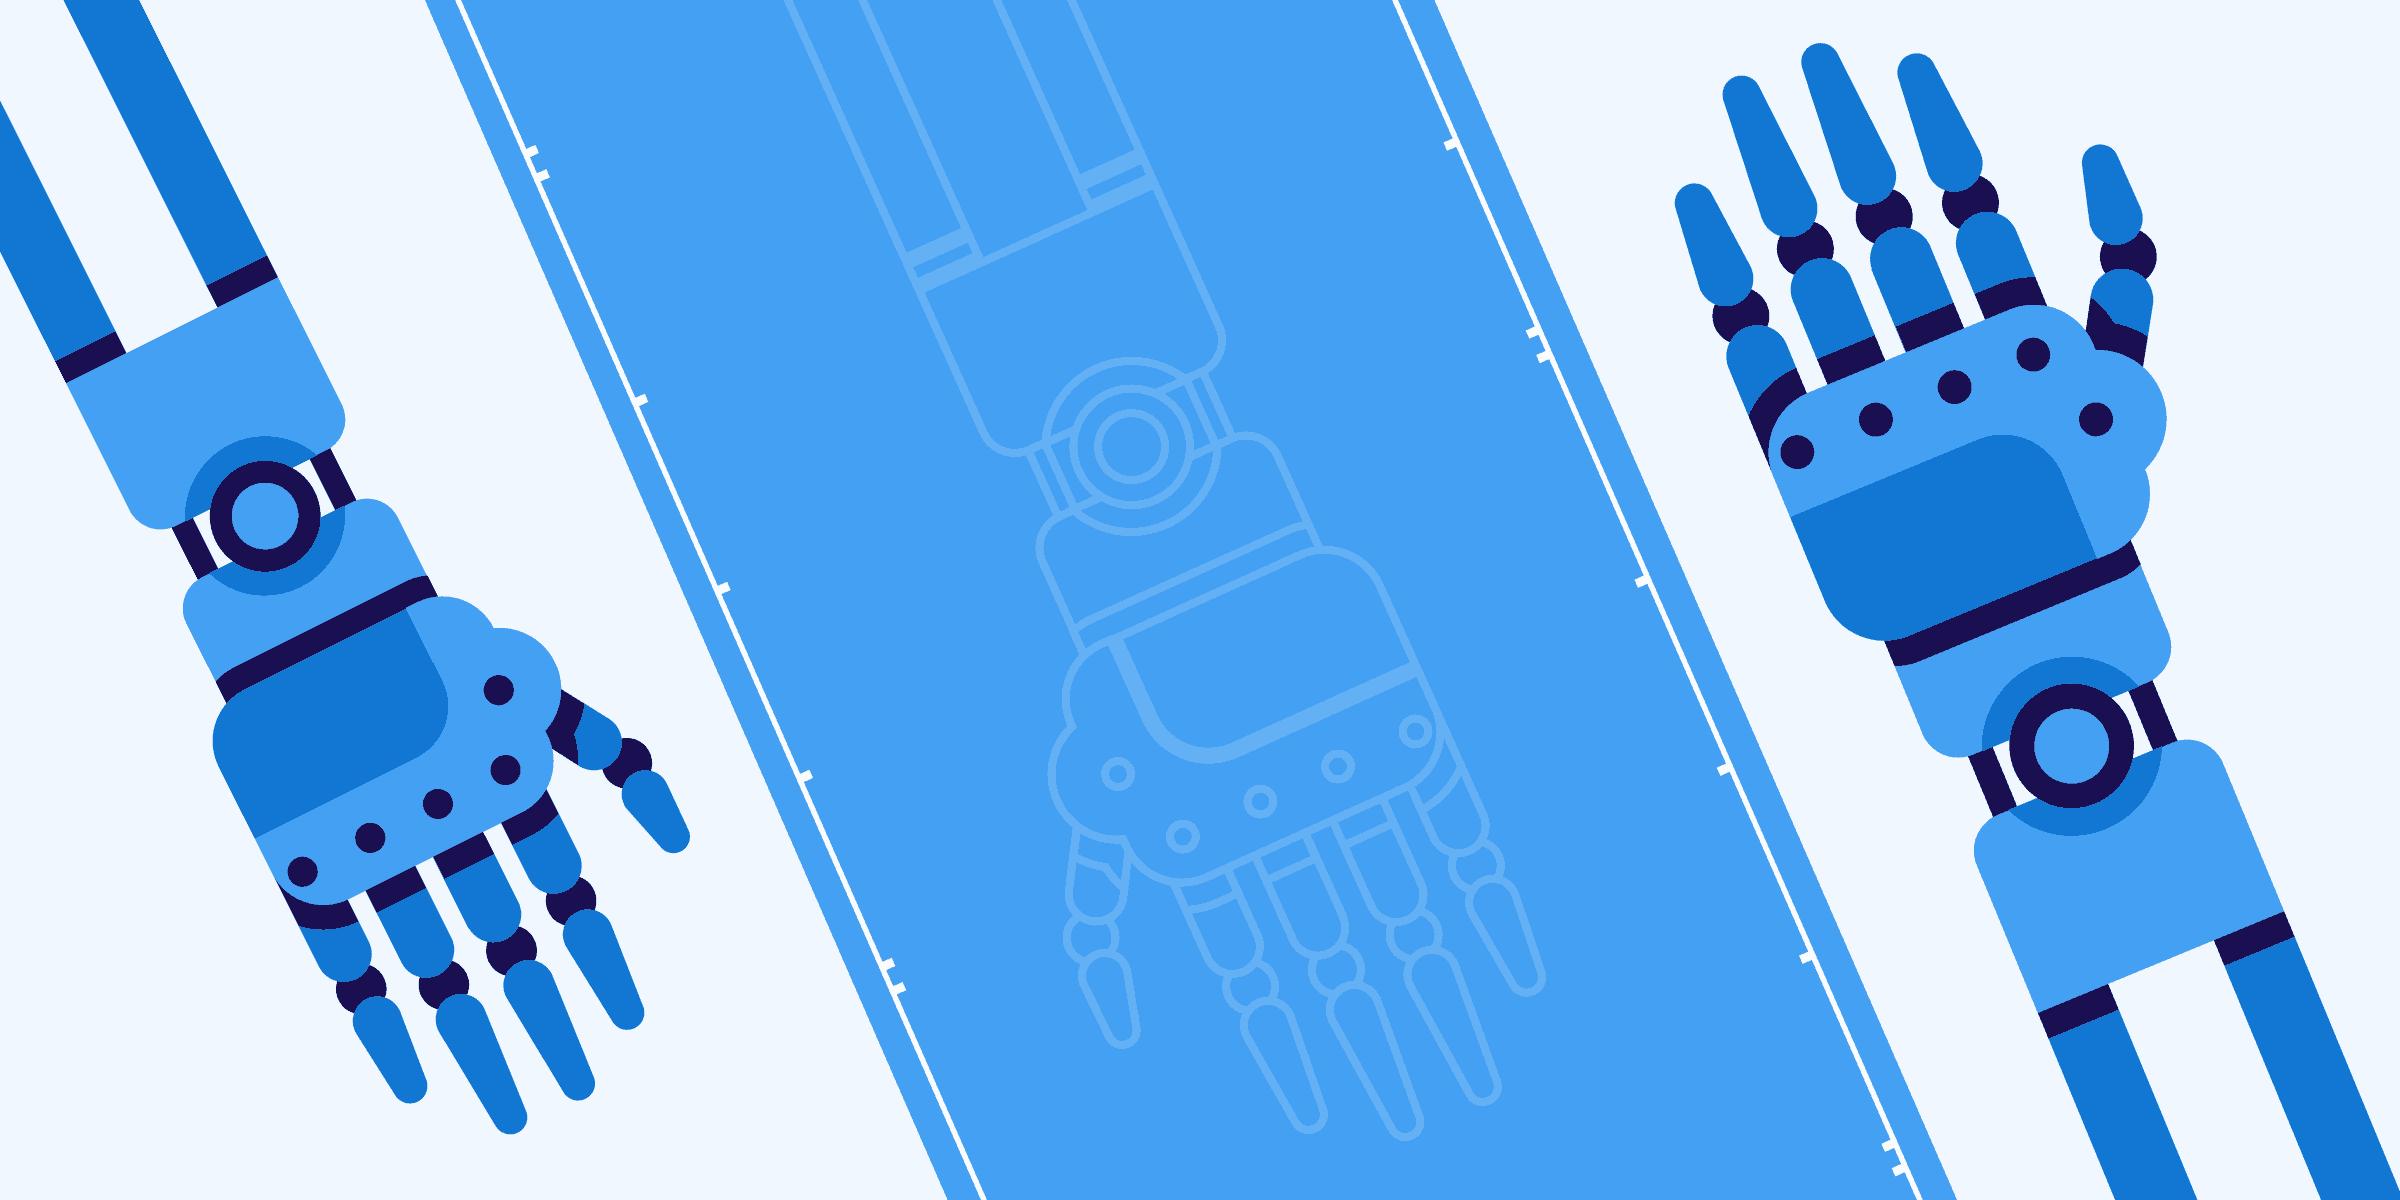 Illustration representing mechatronics and robotics